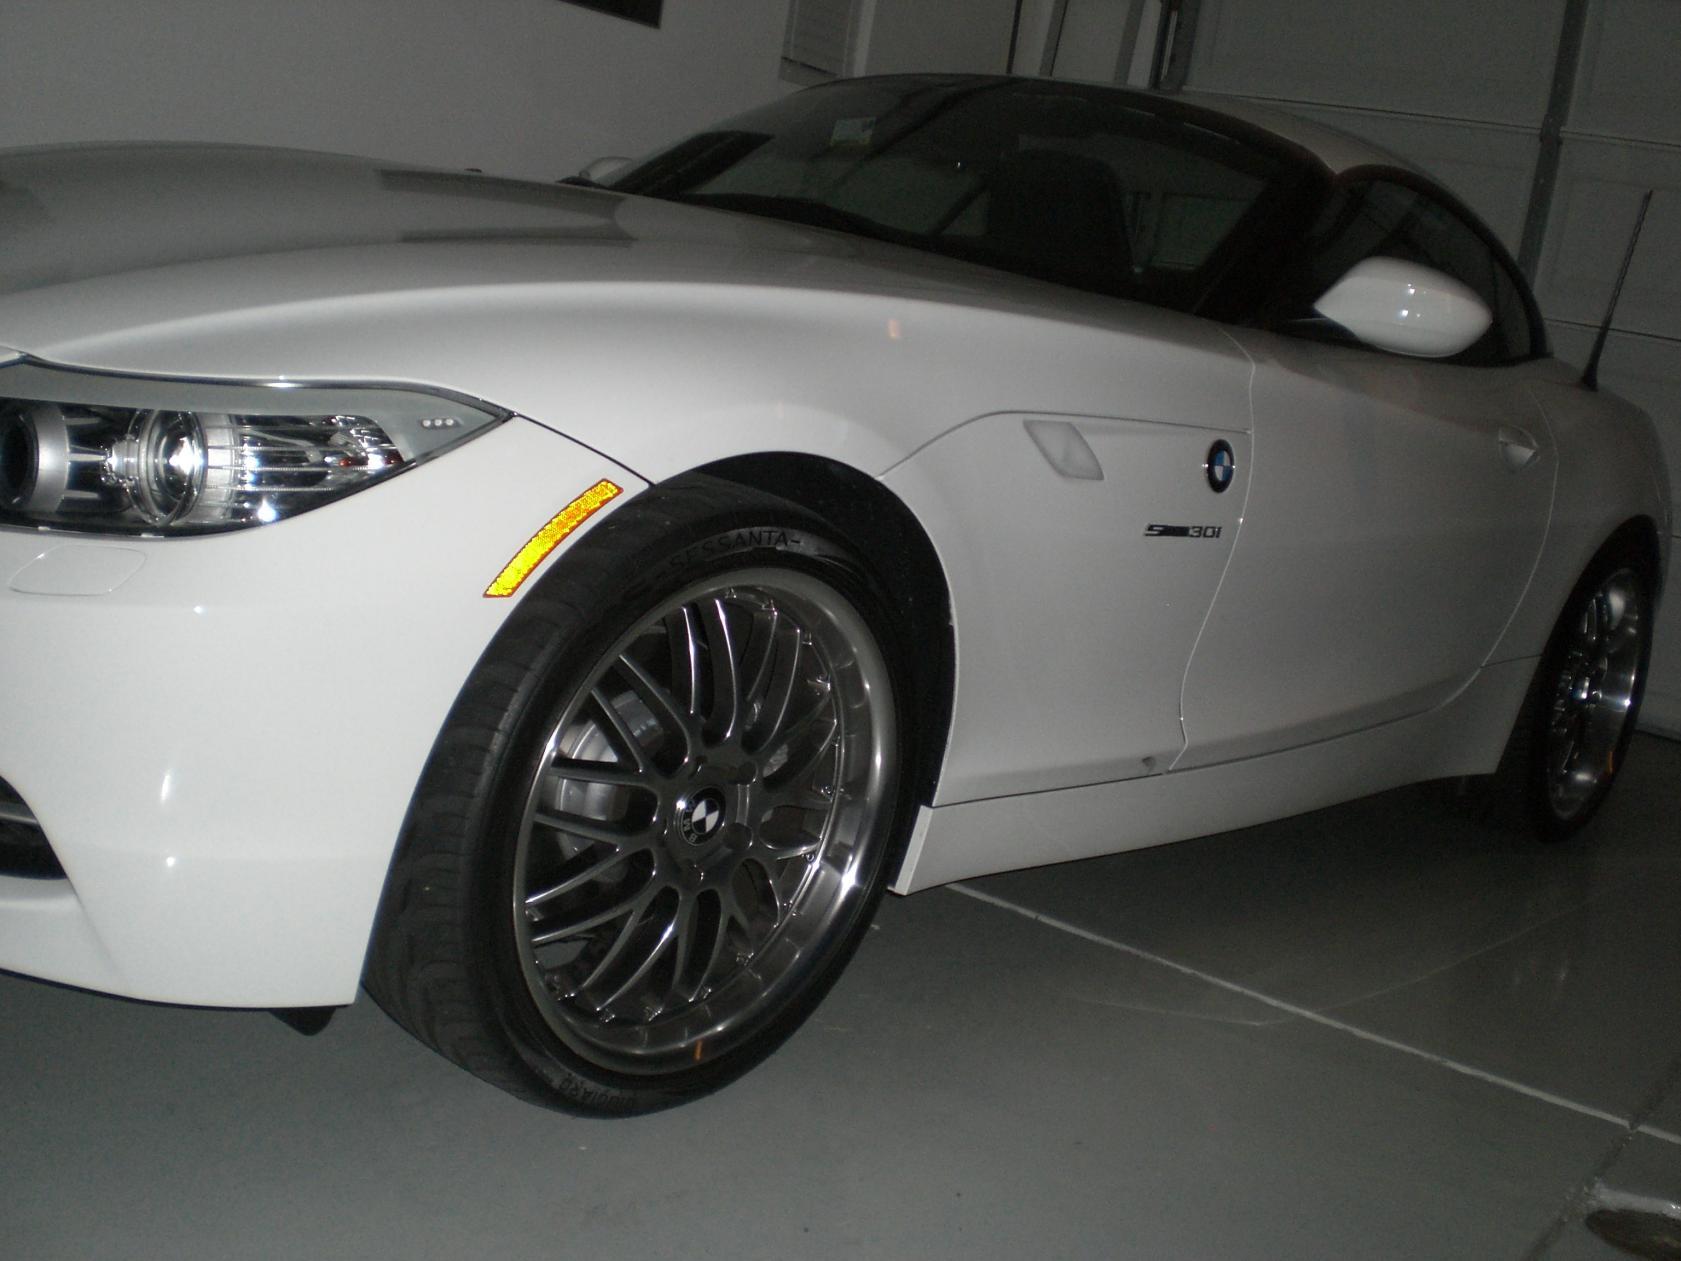 etc racing bmw styling volvo badge hub car product emblem center oz lexus toyota opel mazda wheel for logo store h vw caps kia